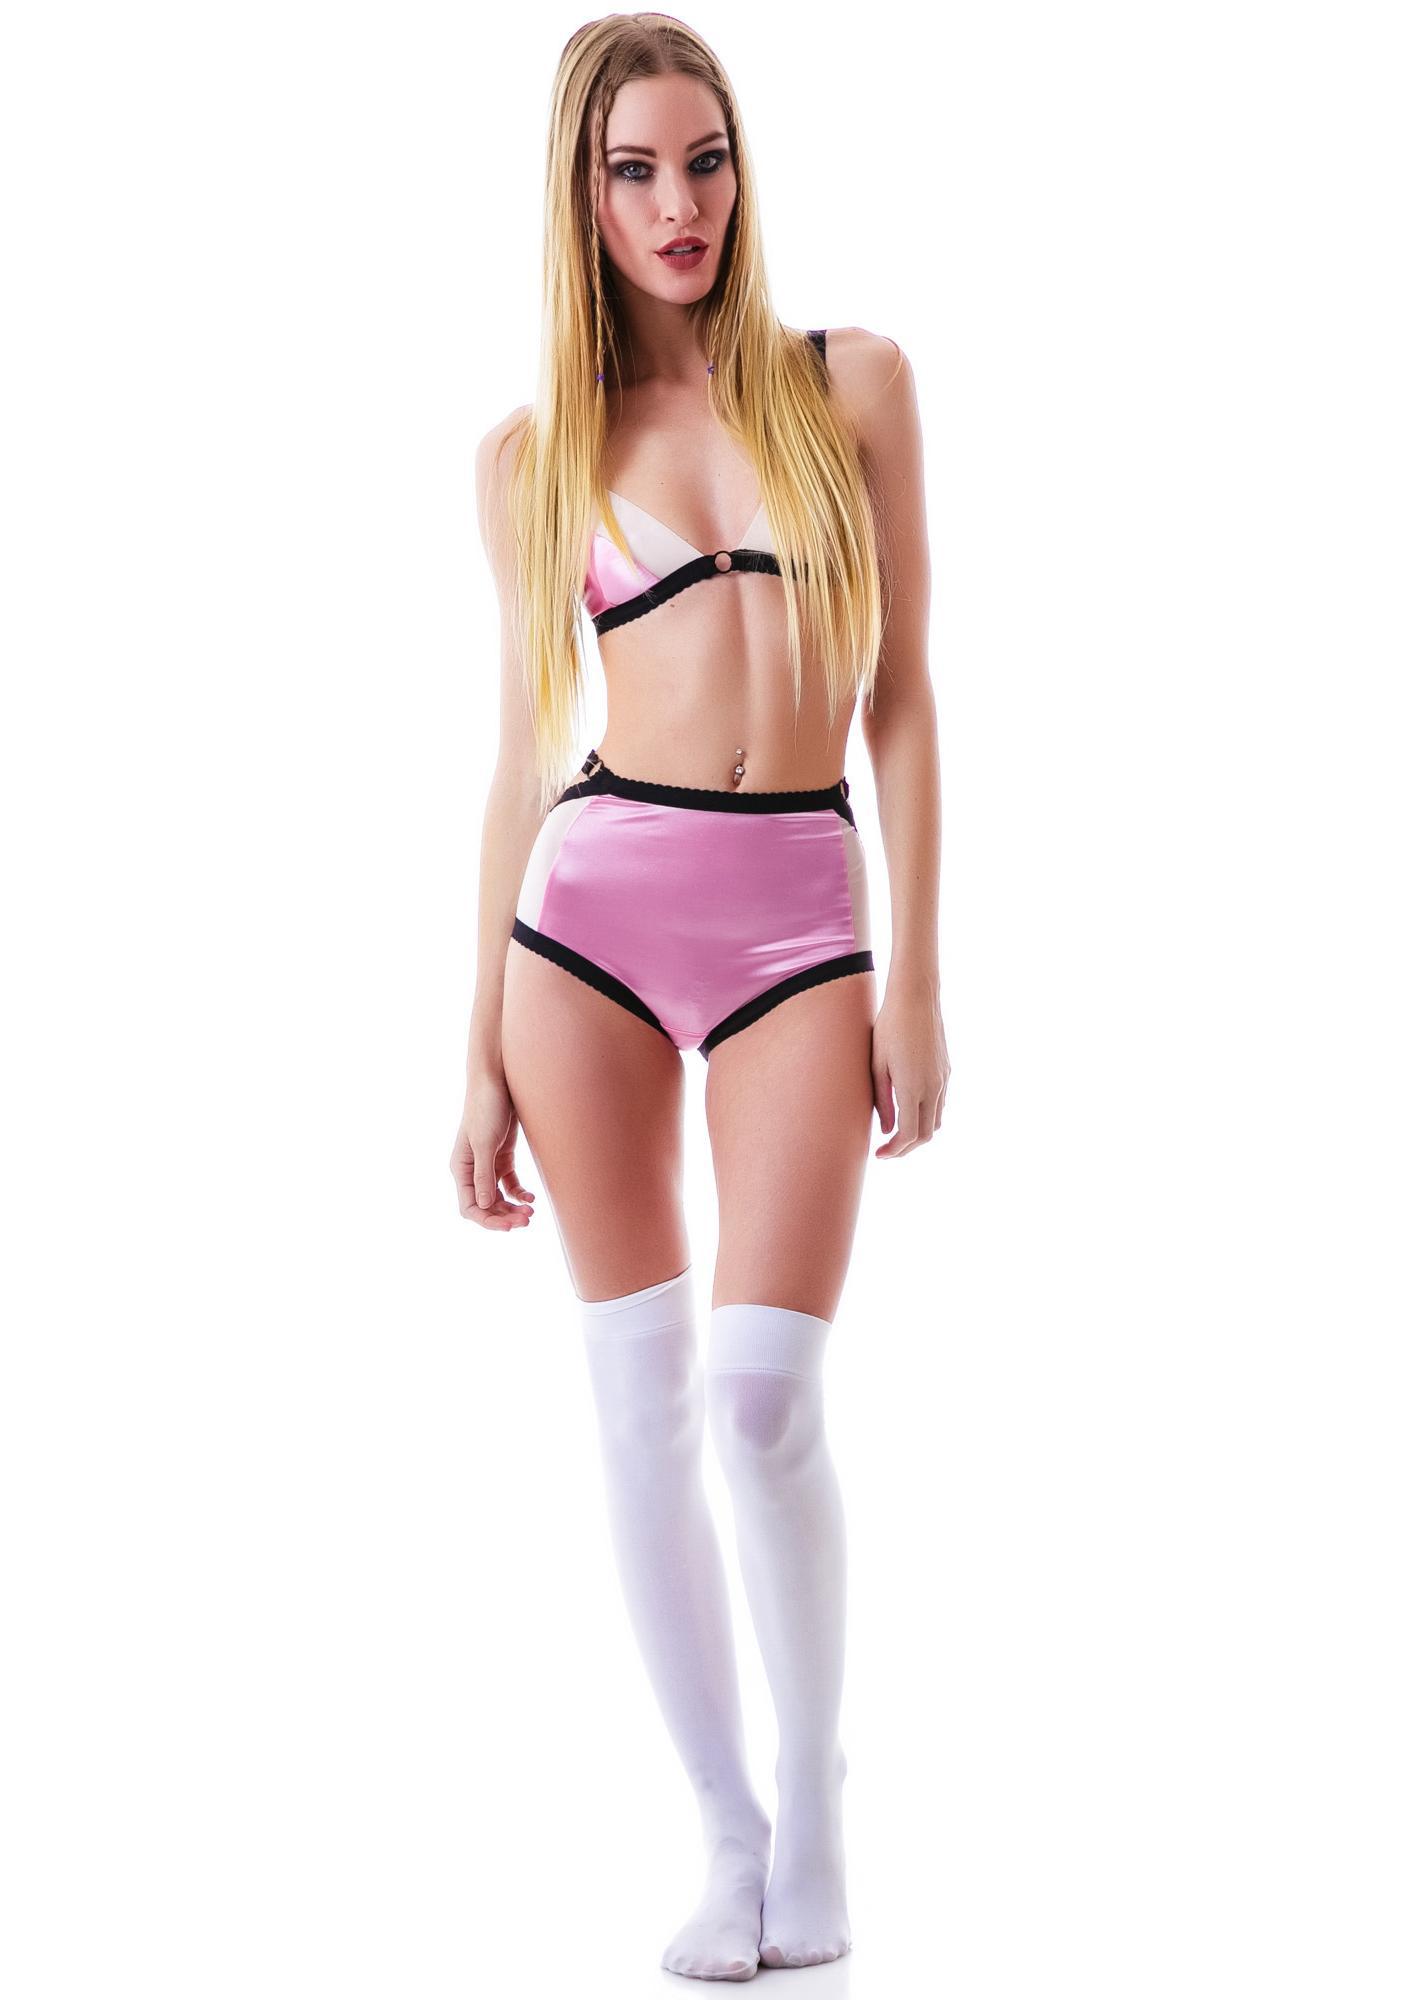 Kayleigh Peddie Laina High Panty